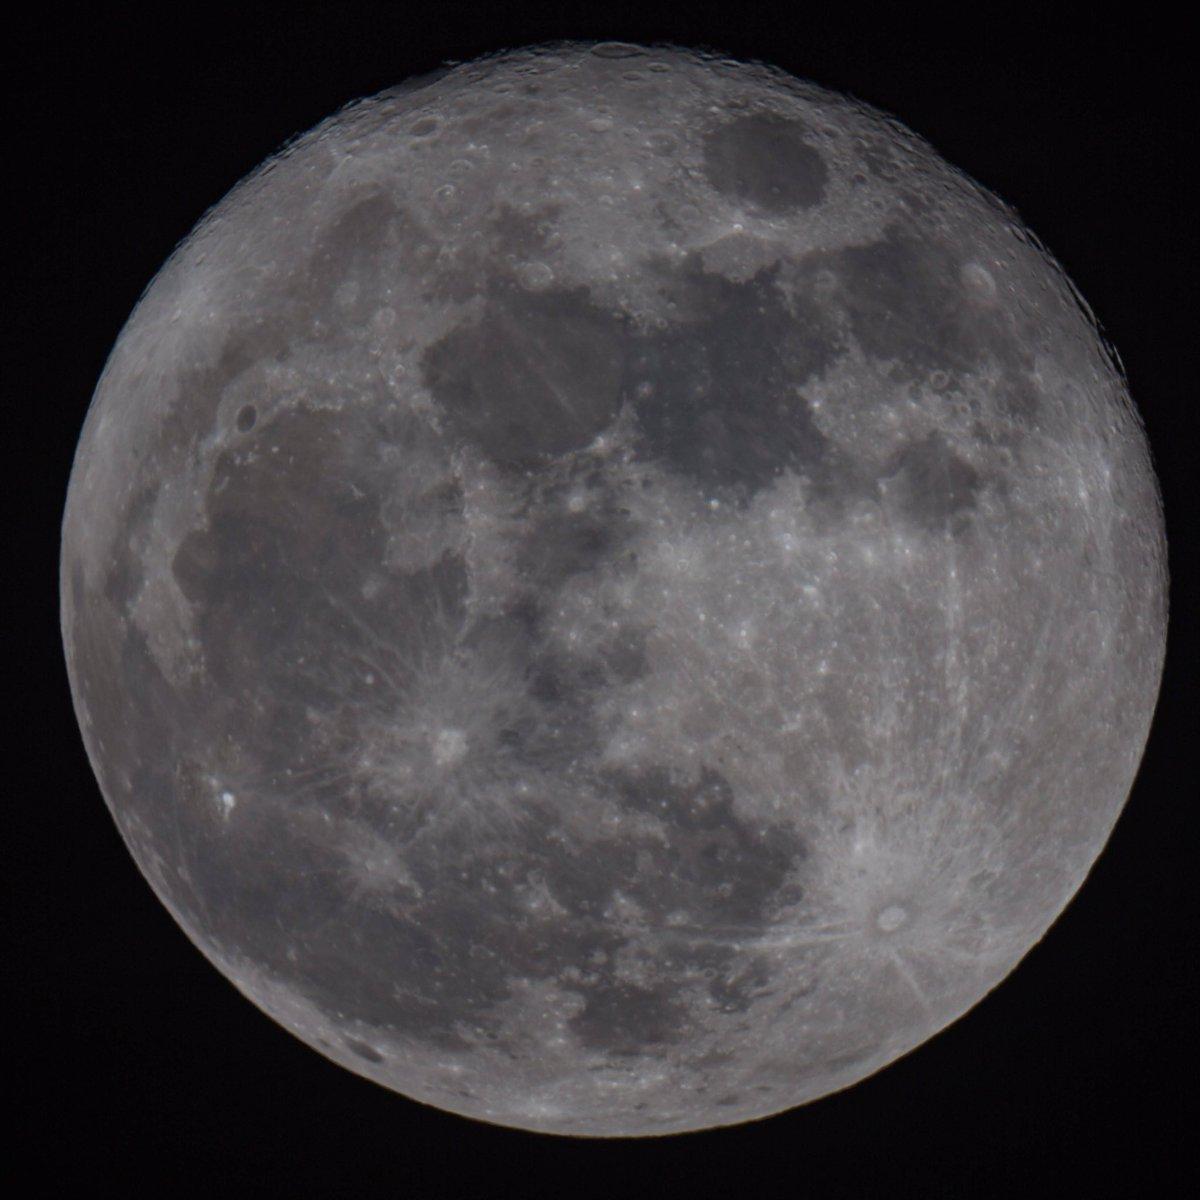 "This evenings stunning moon! DSLR on the 8"" scope.. @VirtualAstro @newburyastro https://t.co/gTBOXtprVF"